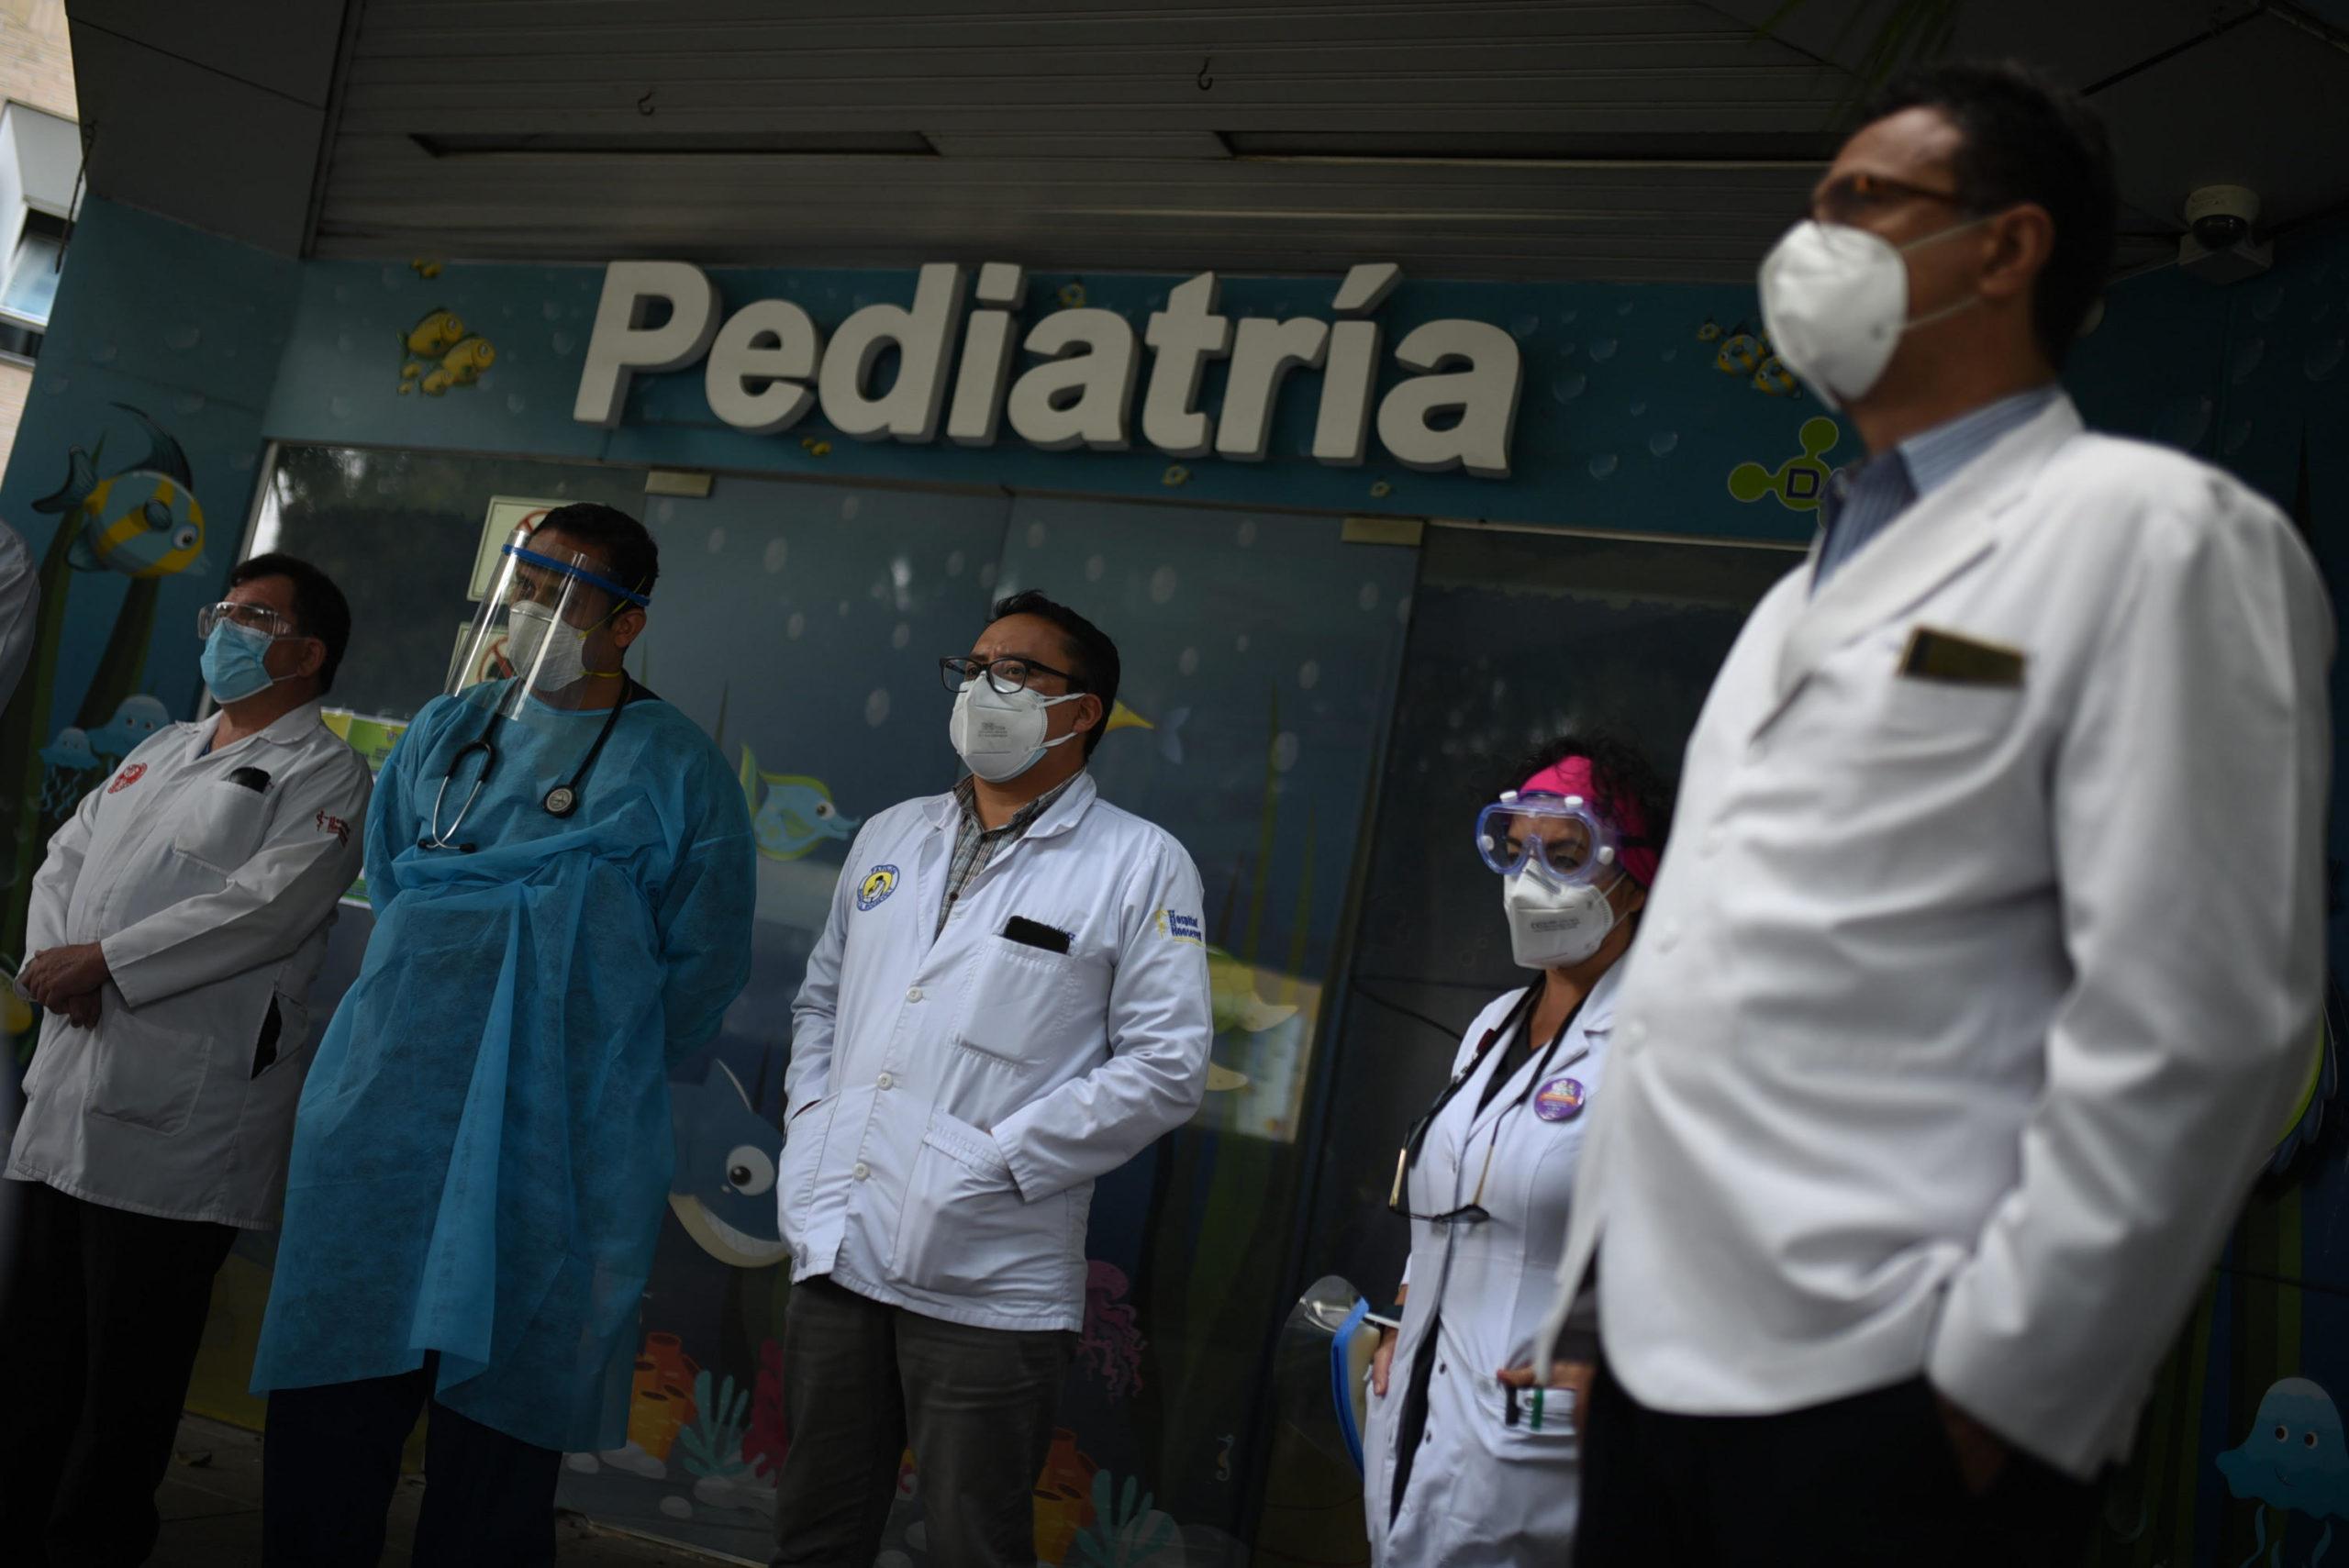 doctores pediatria edwin bercian